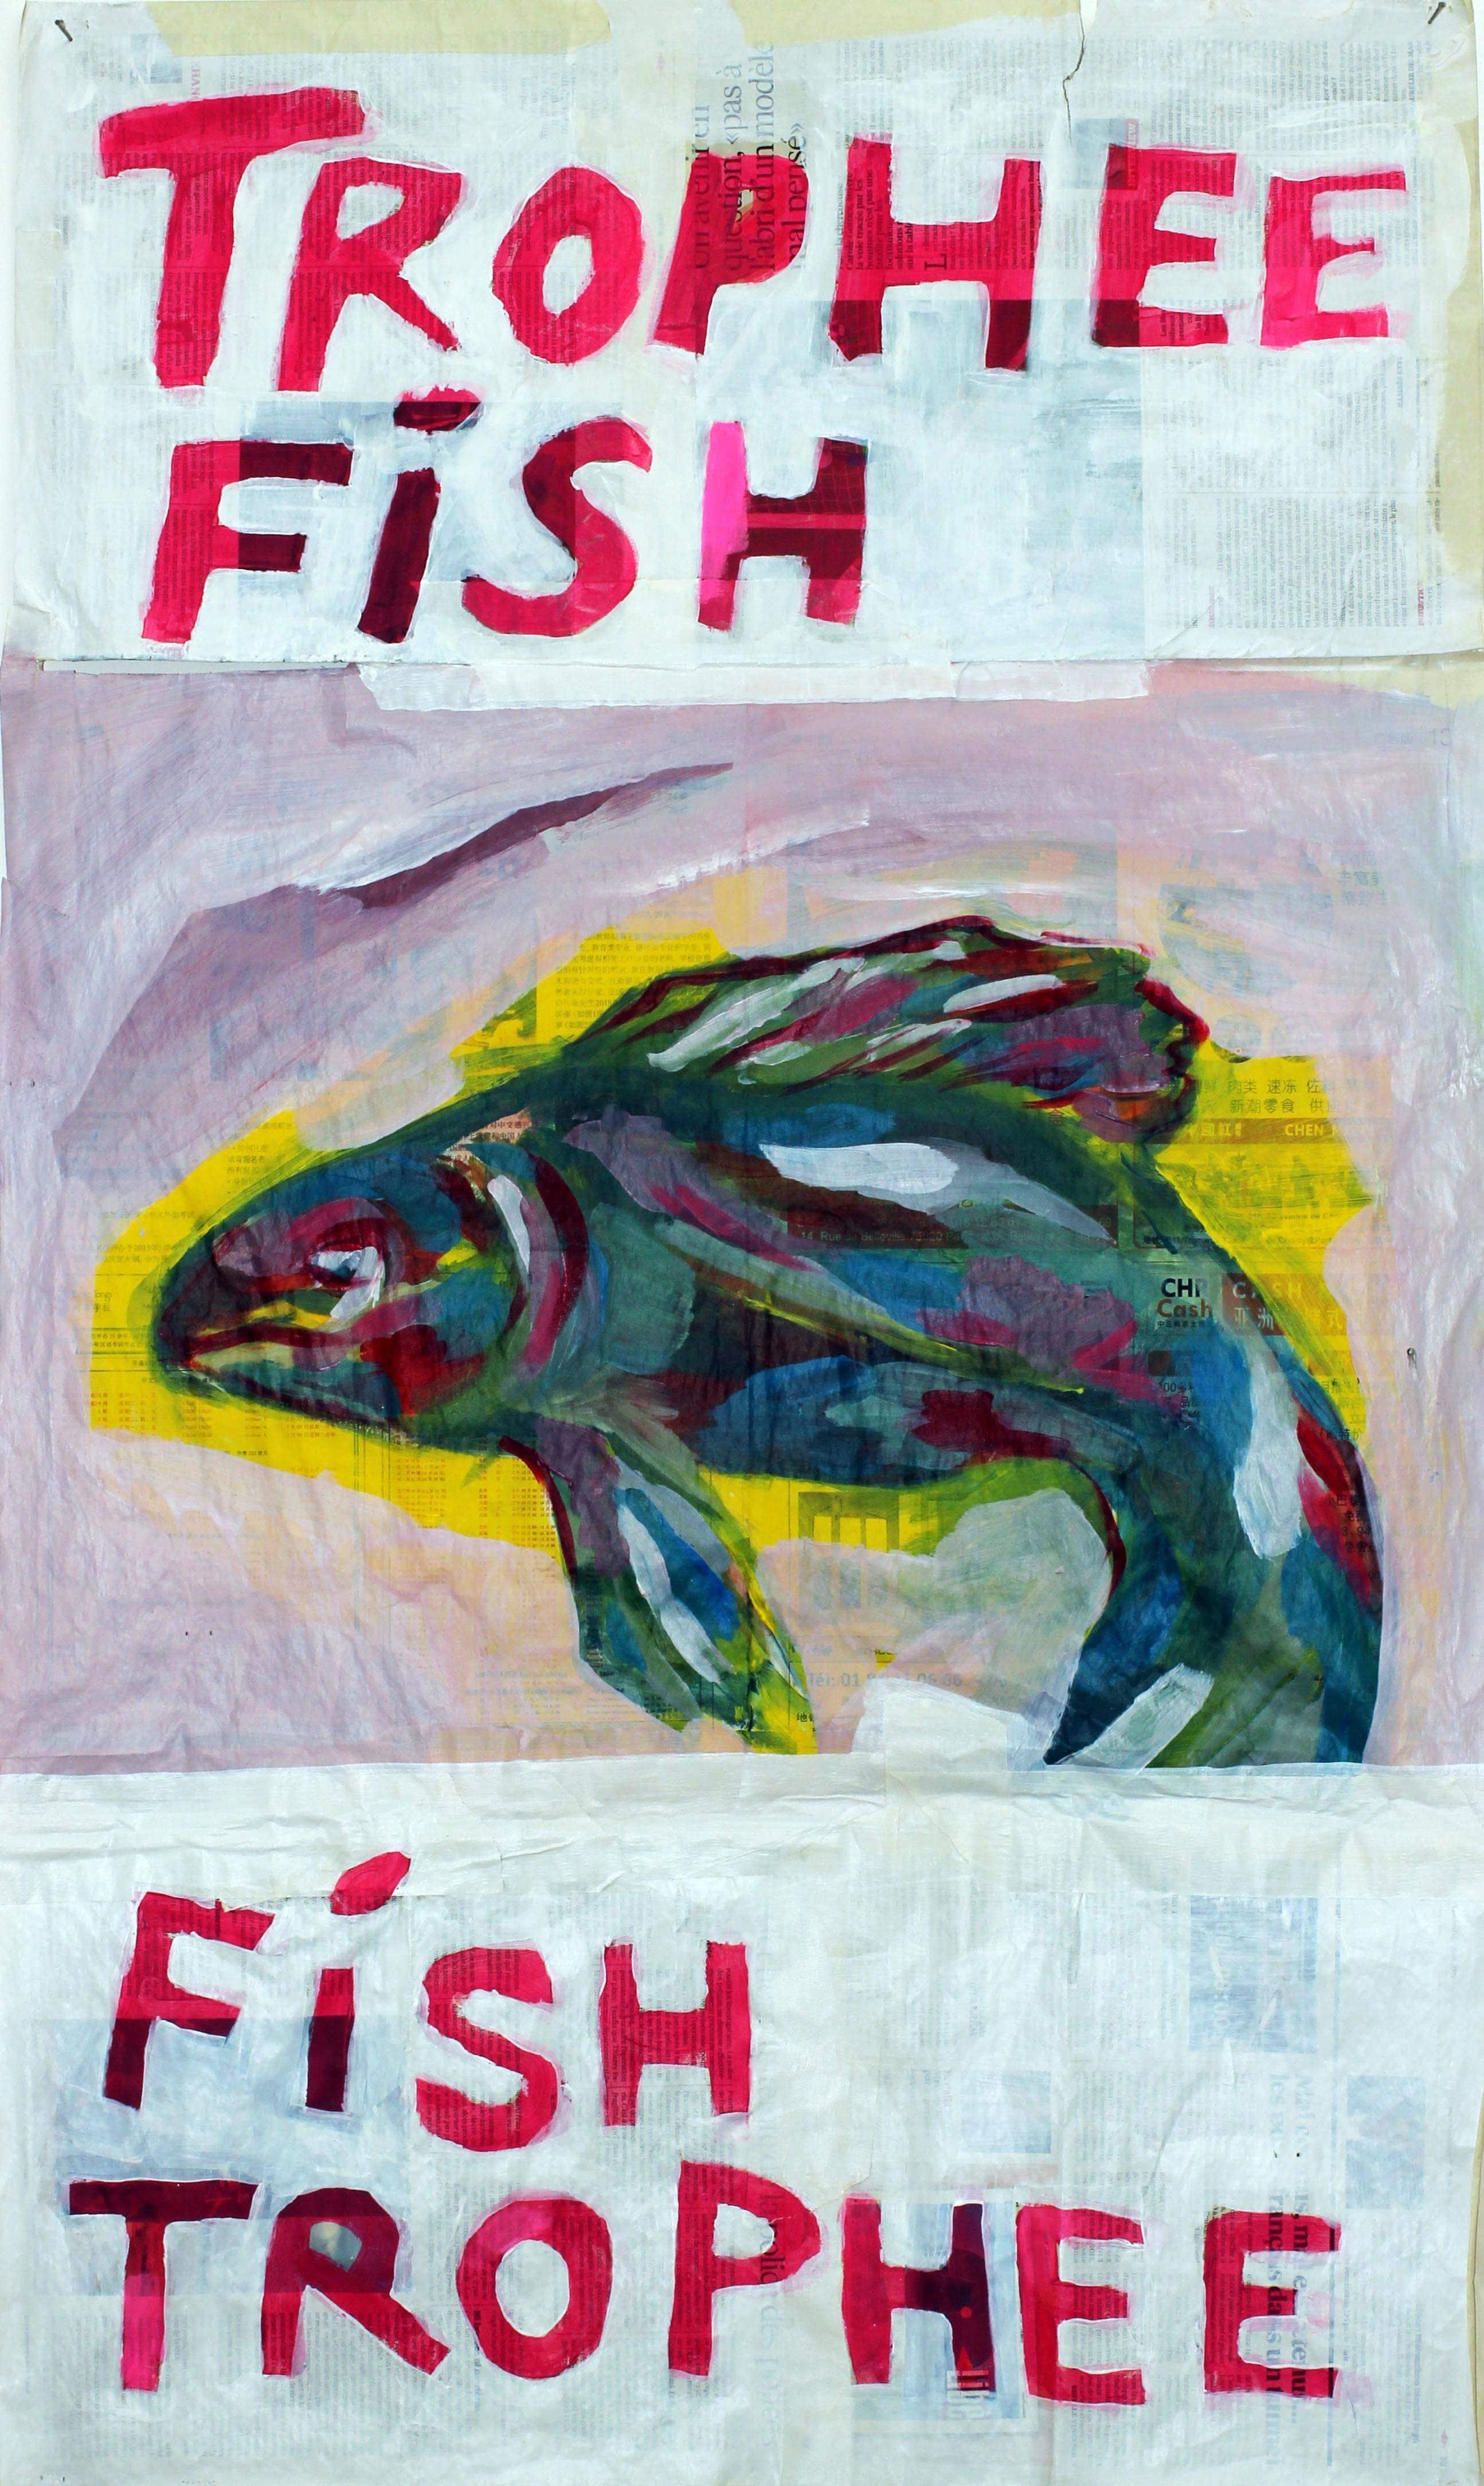 Fish trophee #2